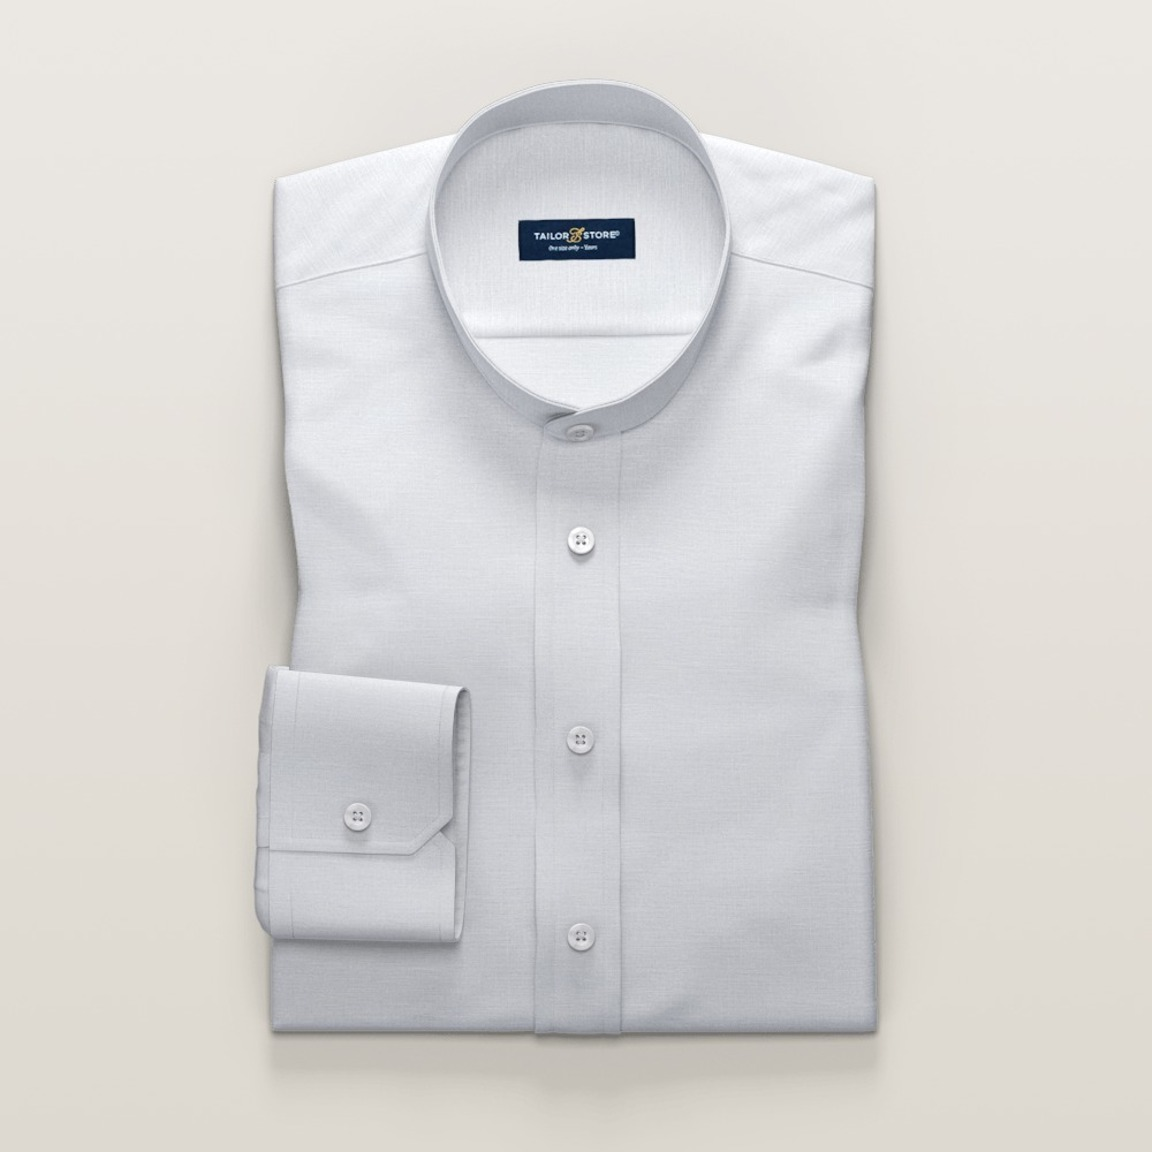 Chemise blanche en lin tendance